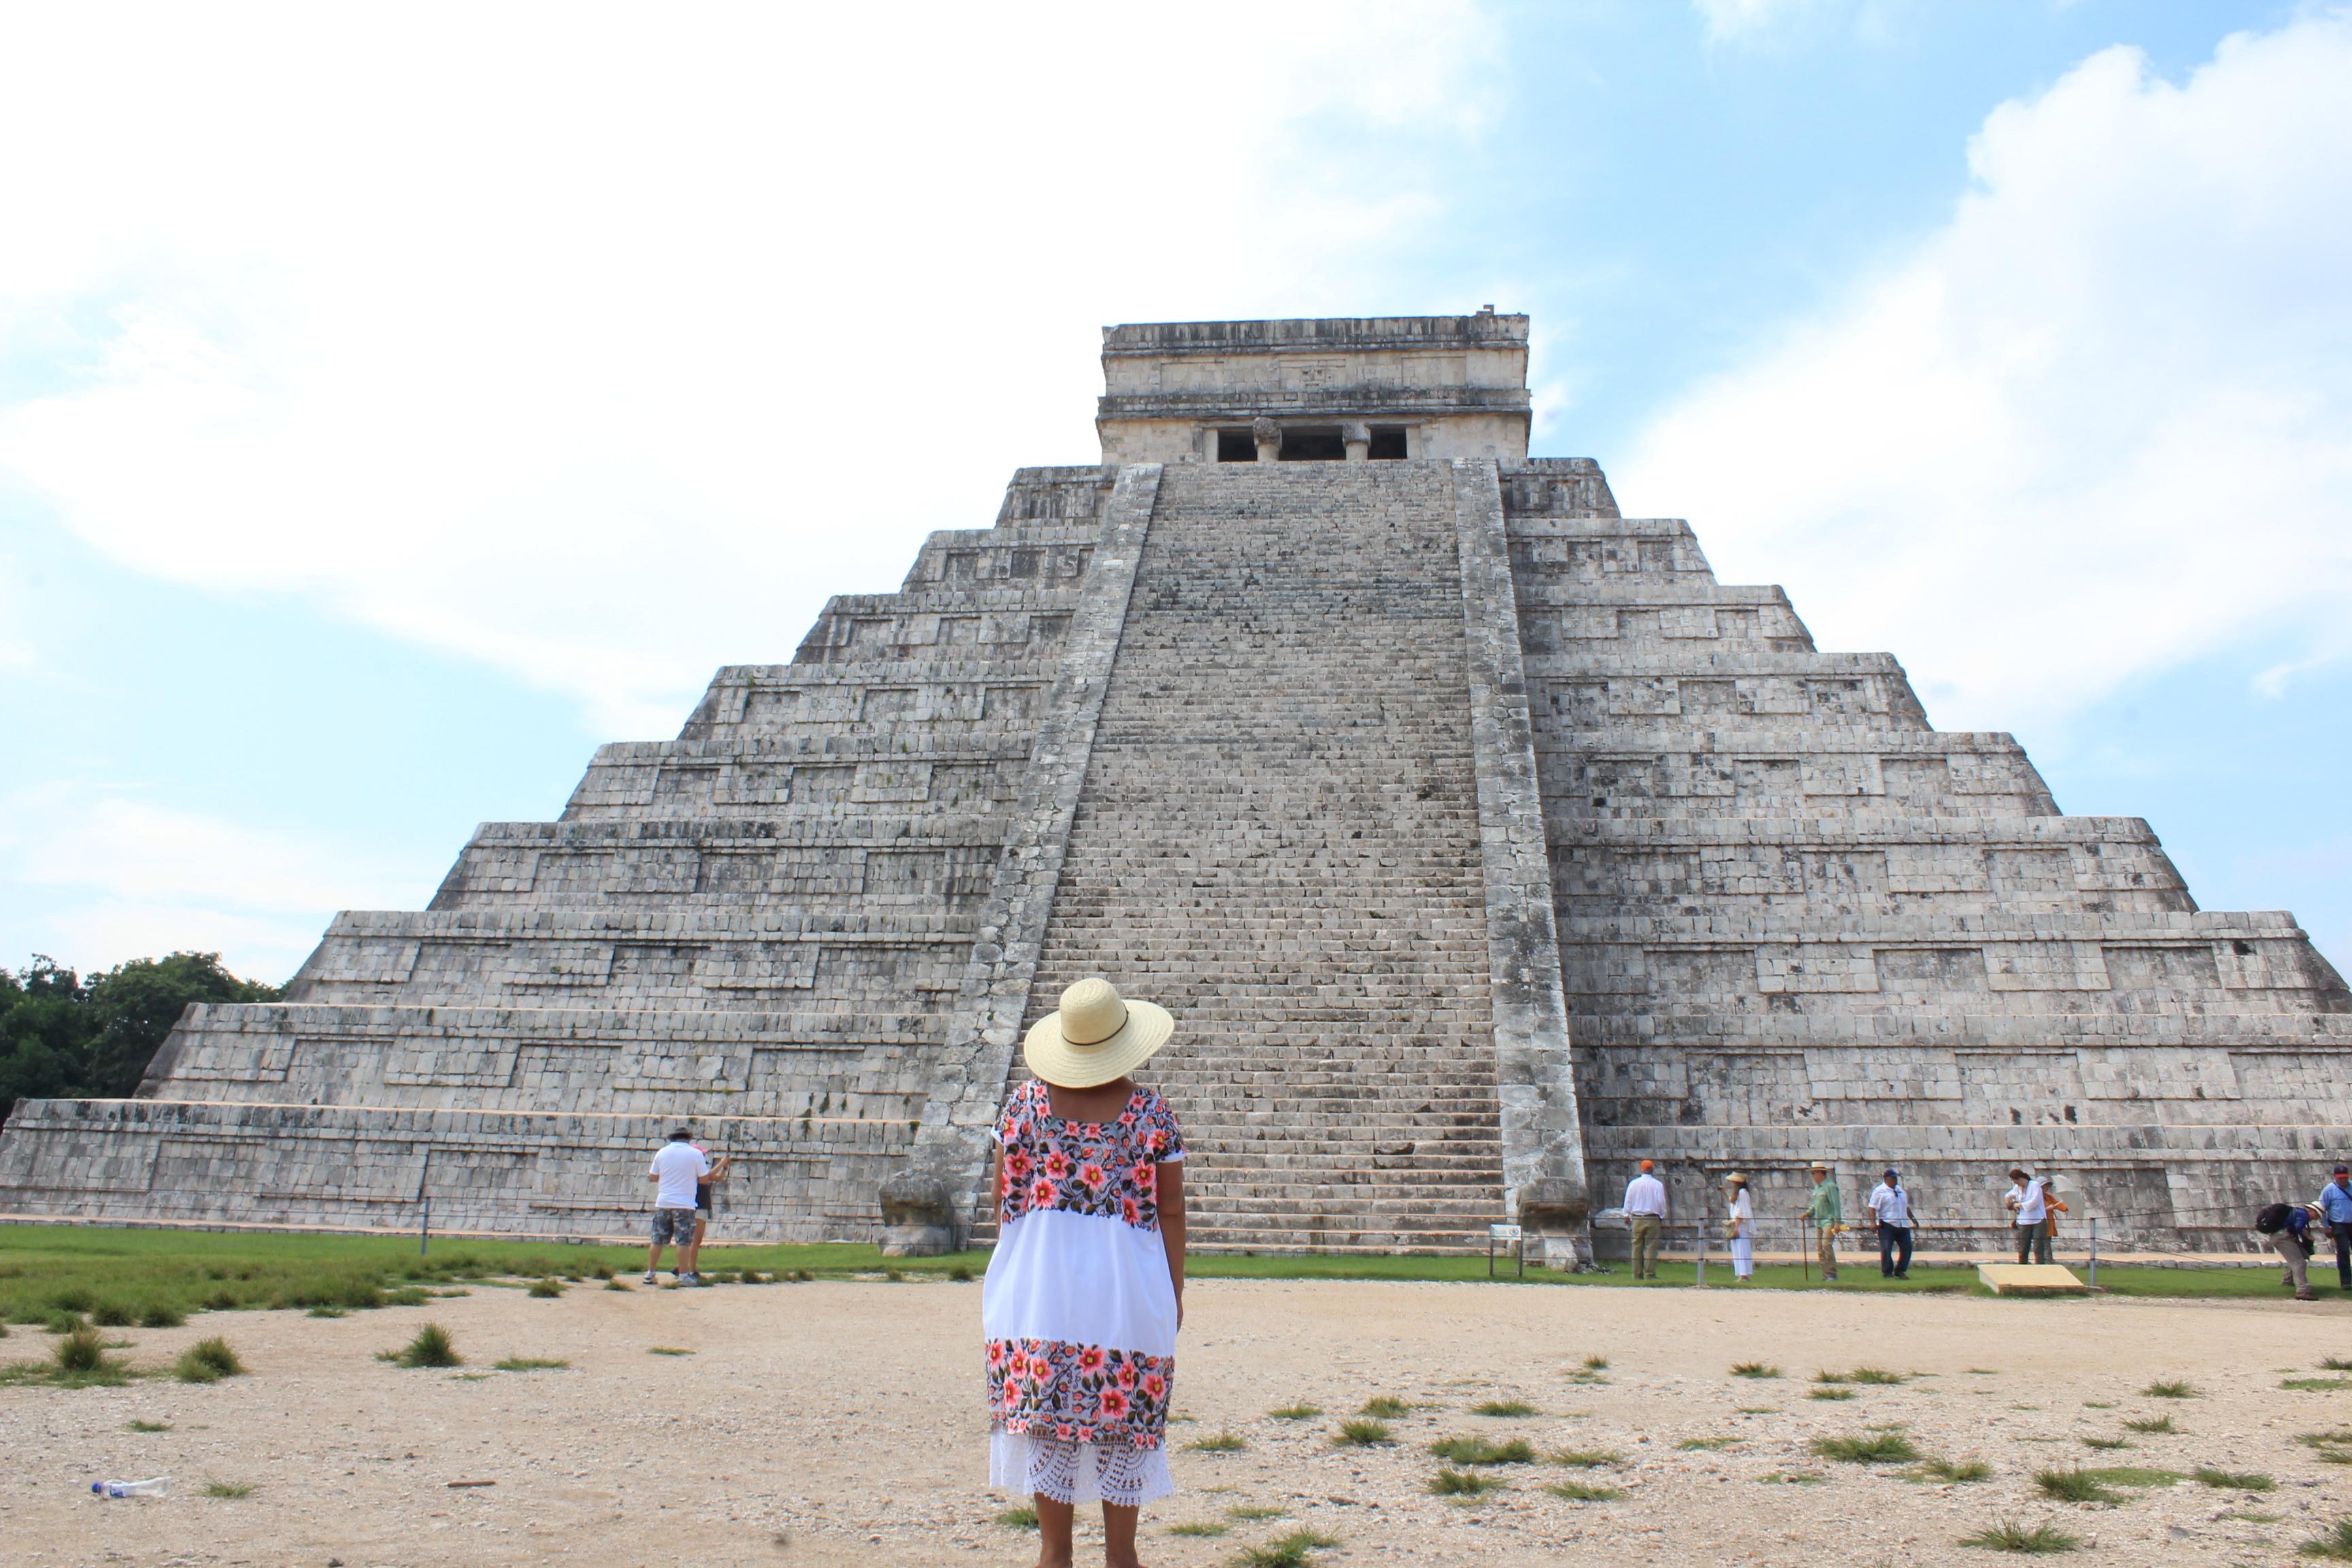 Seguirán exentos yucatecos de pago estatal en zonas arqueológicas